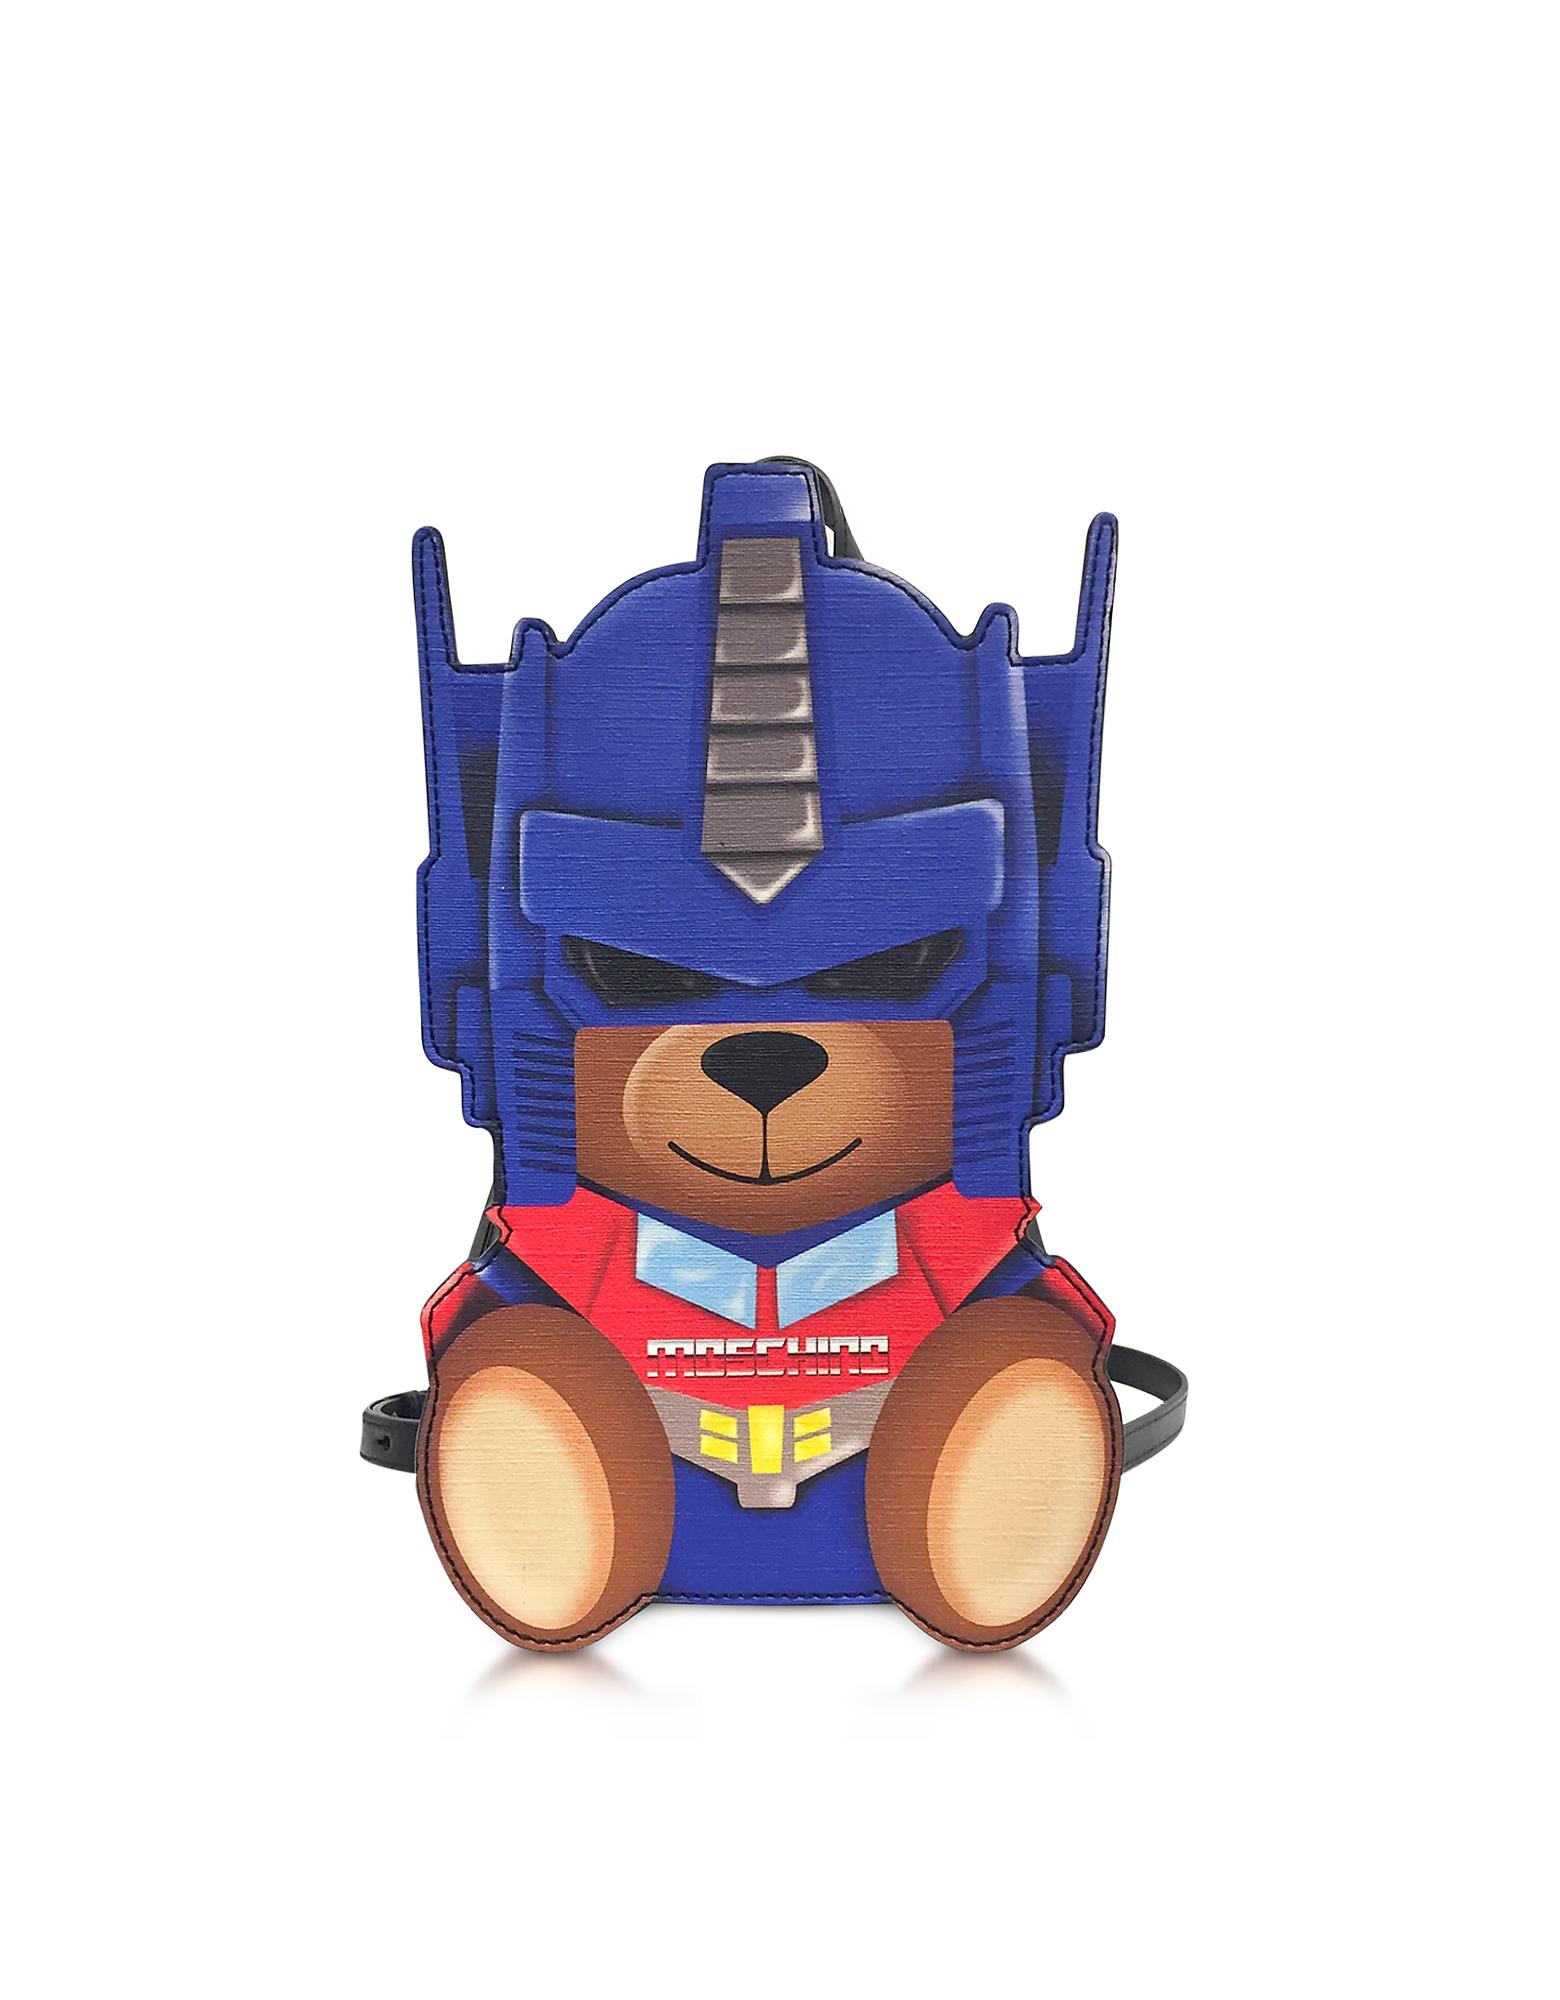 Moschino Transformers Blue Print Polyurethane Backpack